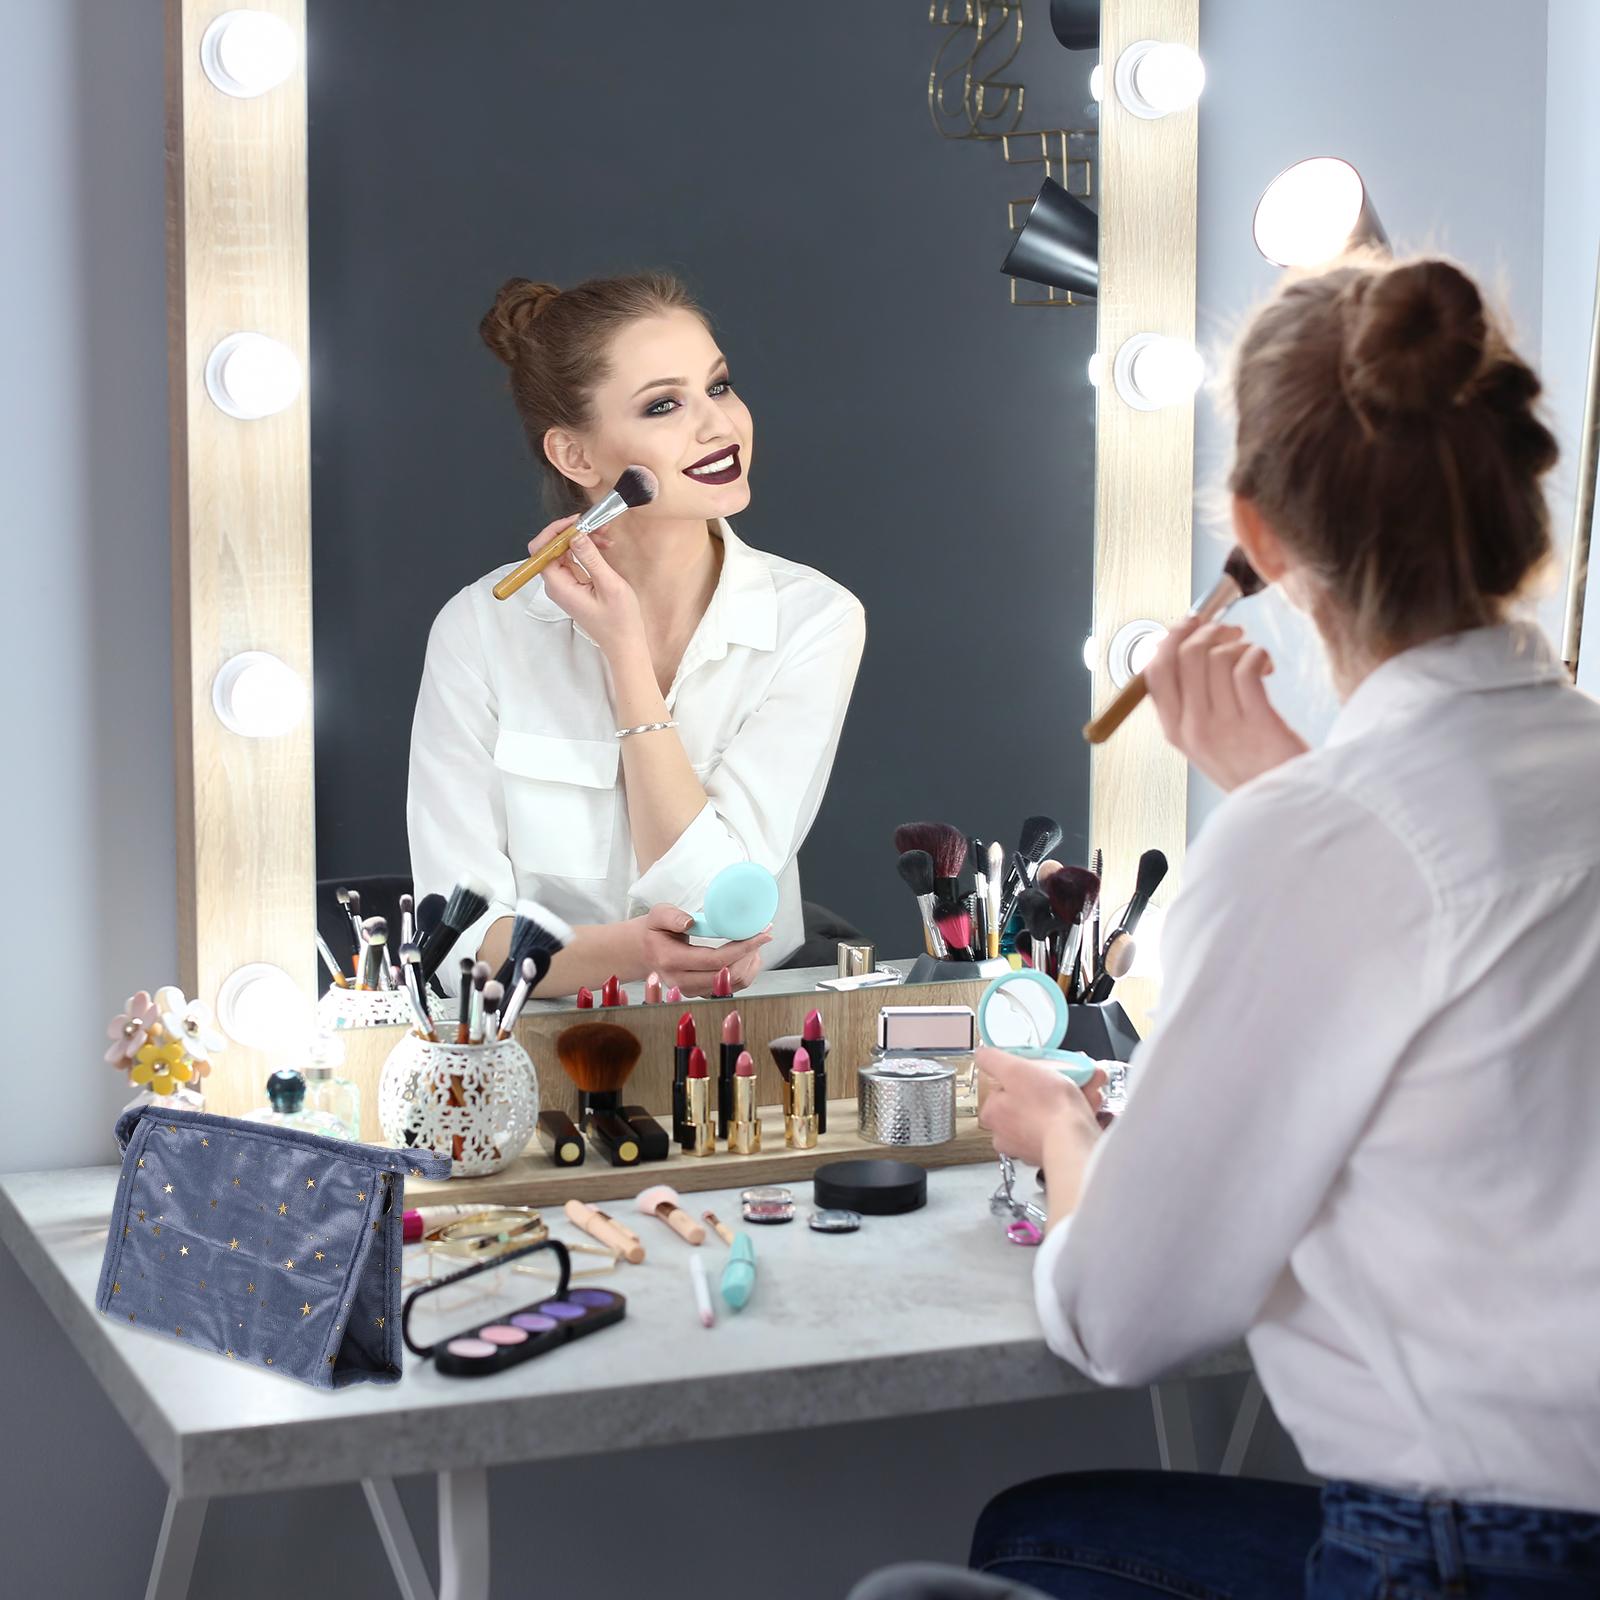 Cosmetic Bag for Women, 2pcs Plush Travel Makeup Storage Pouch Portable Makeup Bag